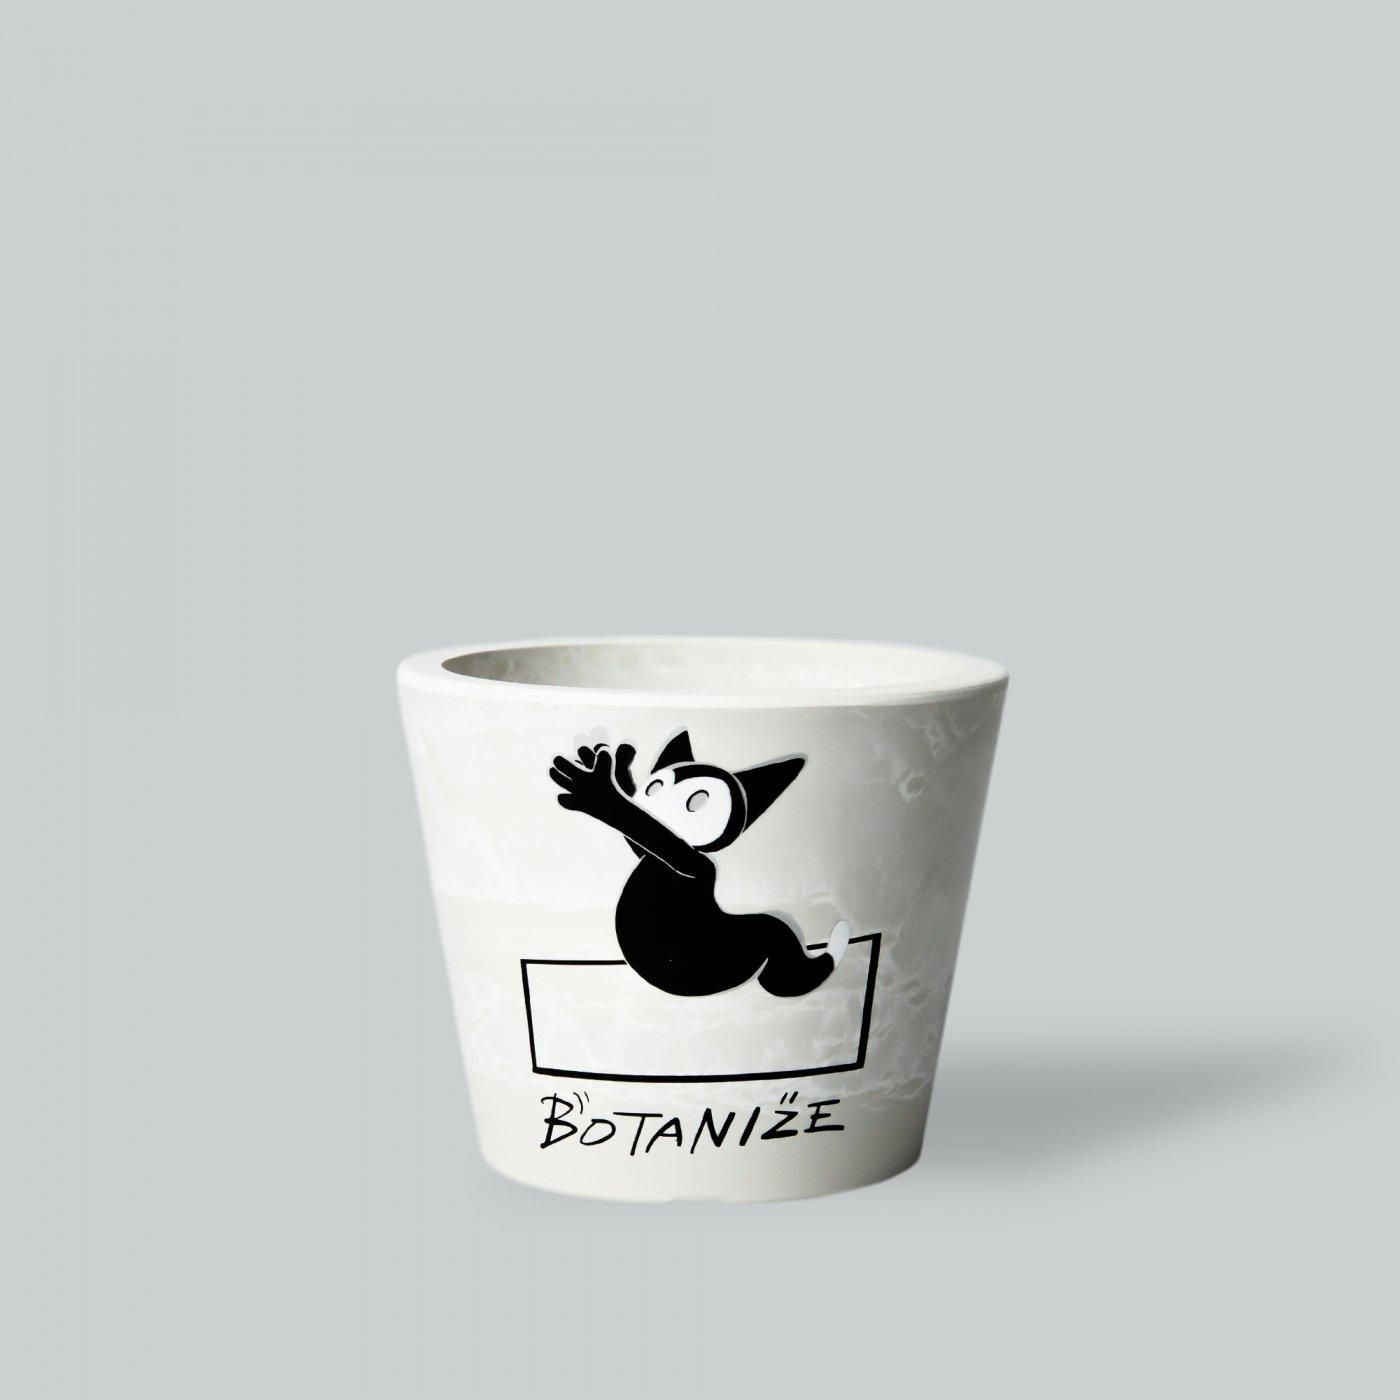 Lotta × BOTANIZE Plastic Pot  SP1